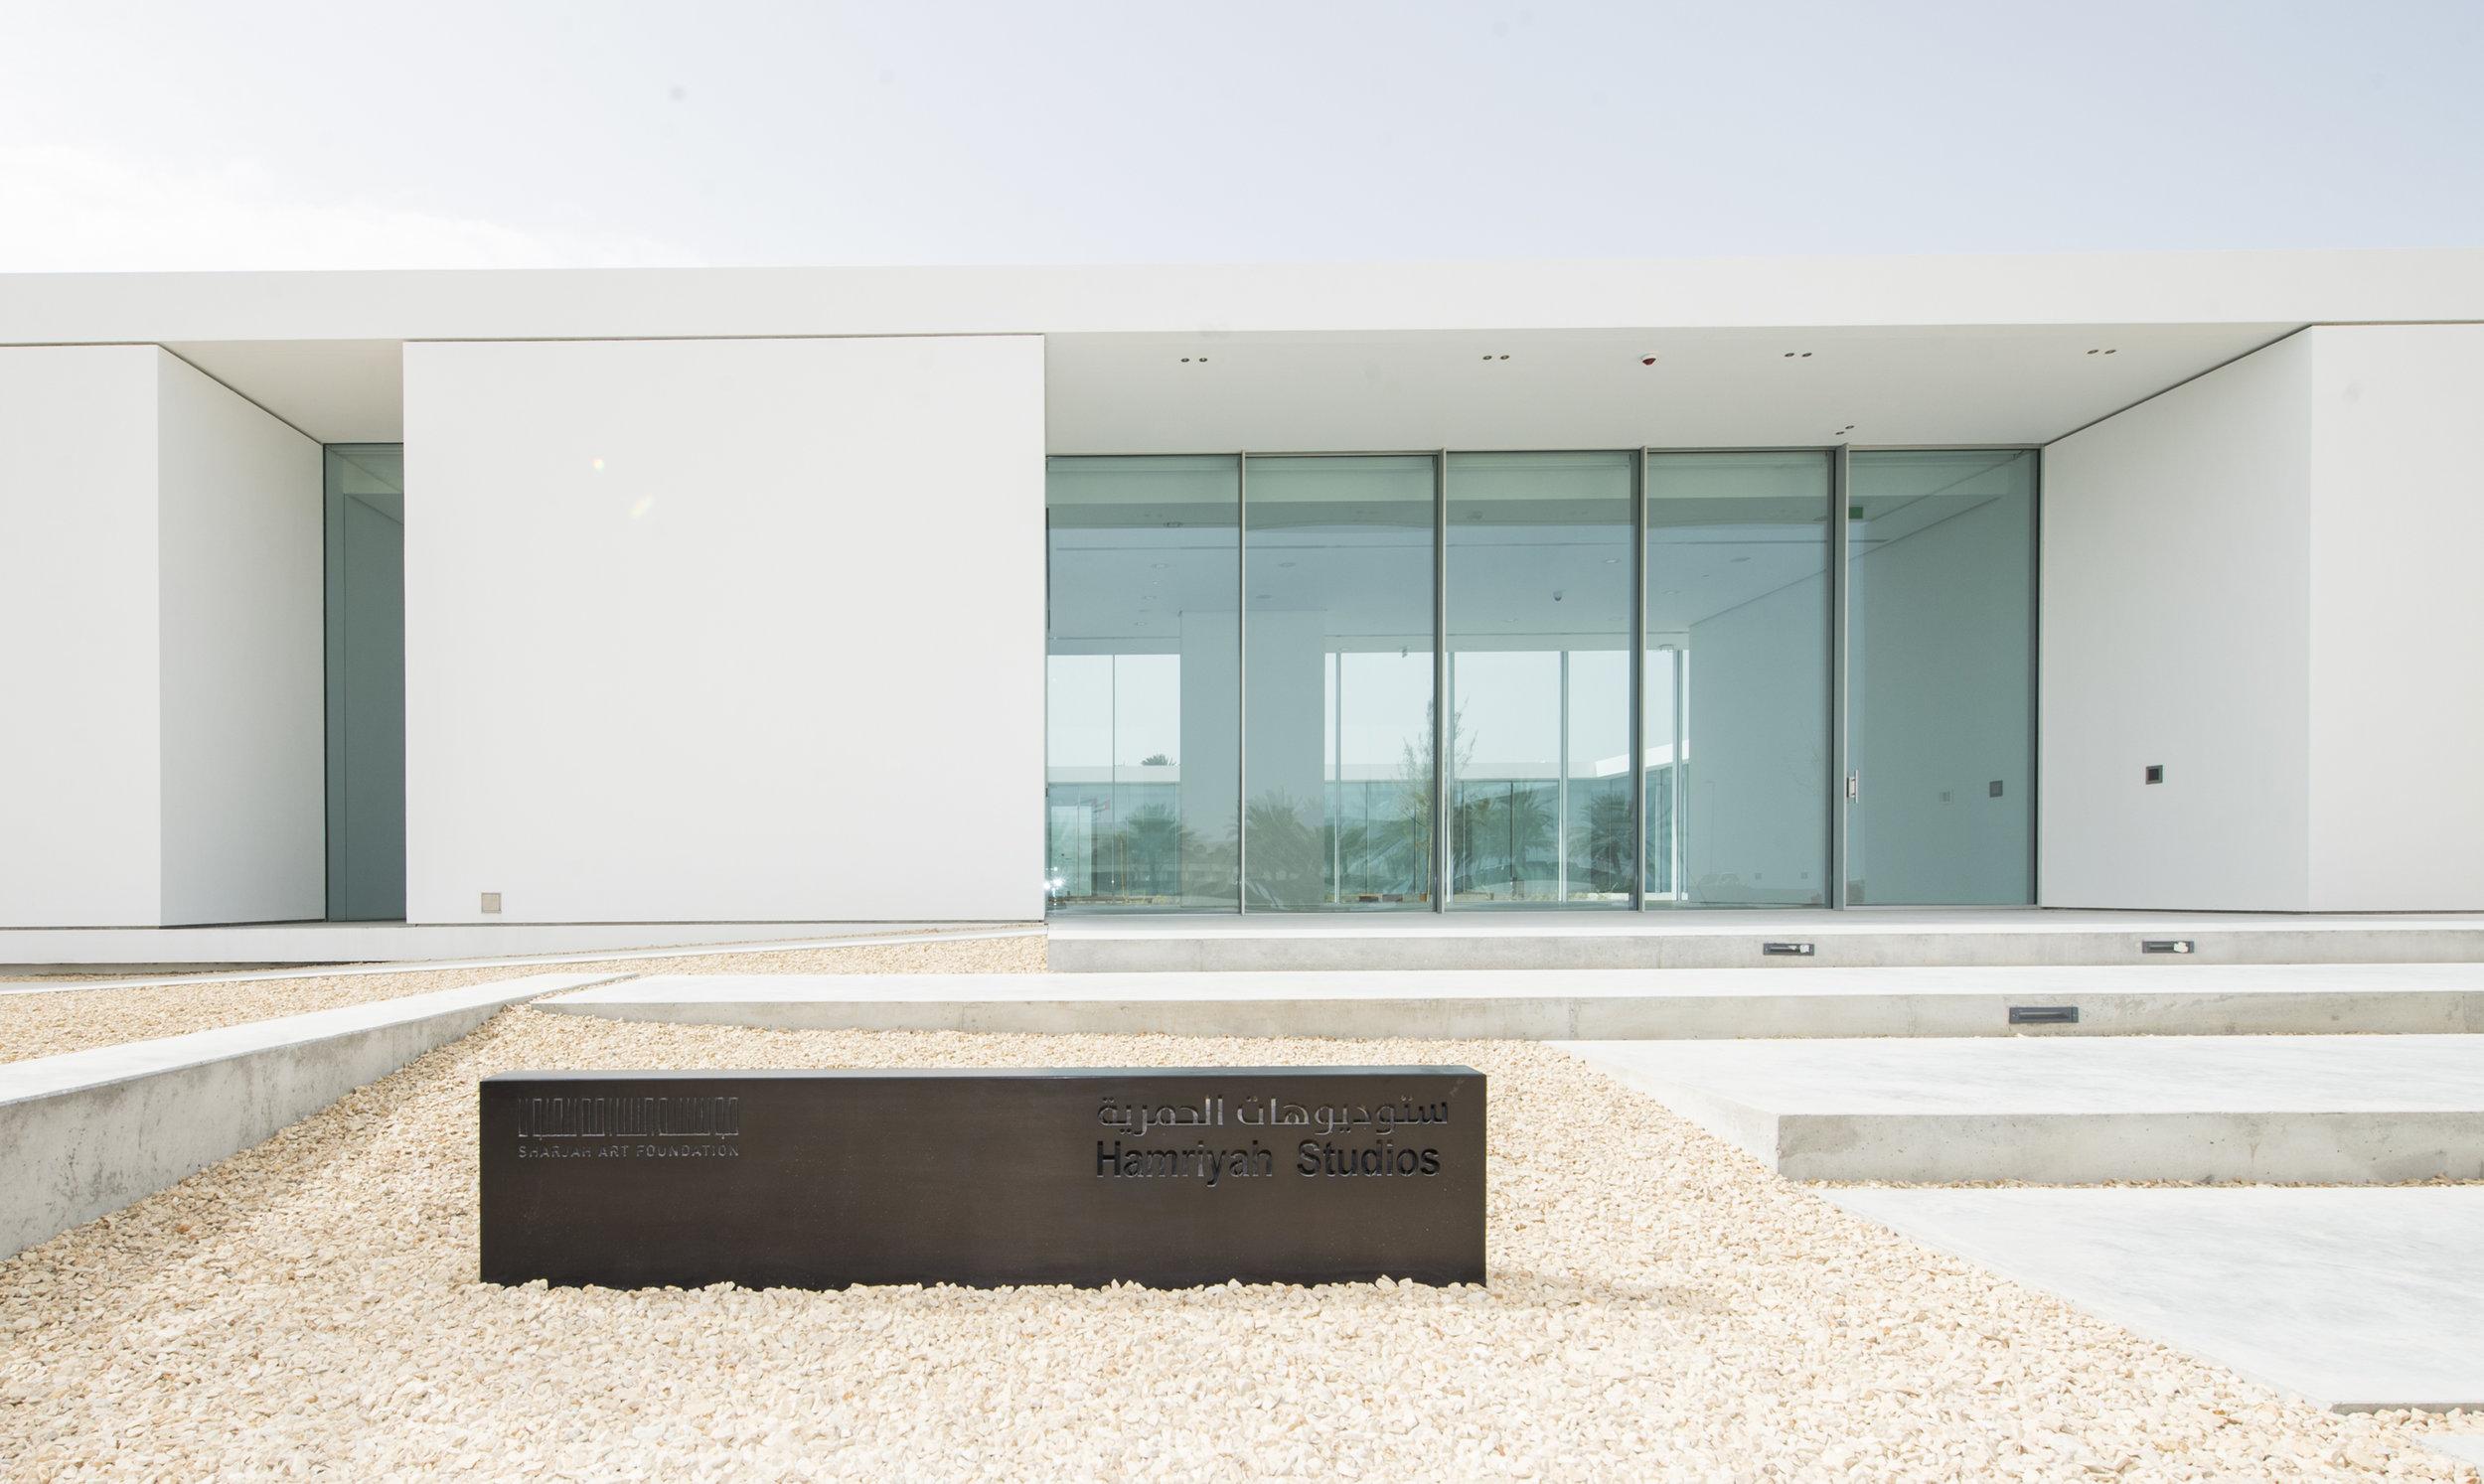 Al Hamriyah Studios. Image courtesy of Sharjah Art Foundation